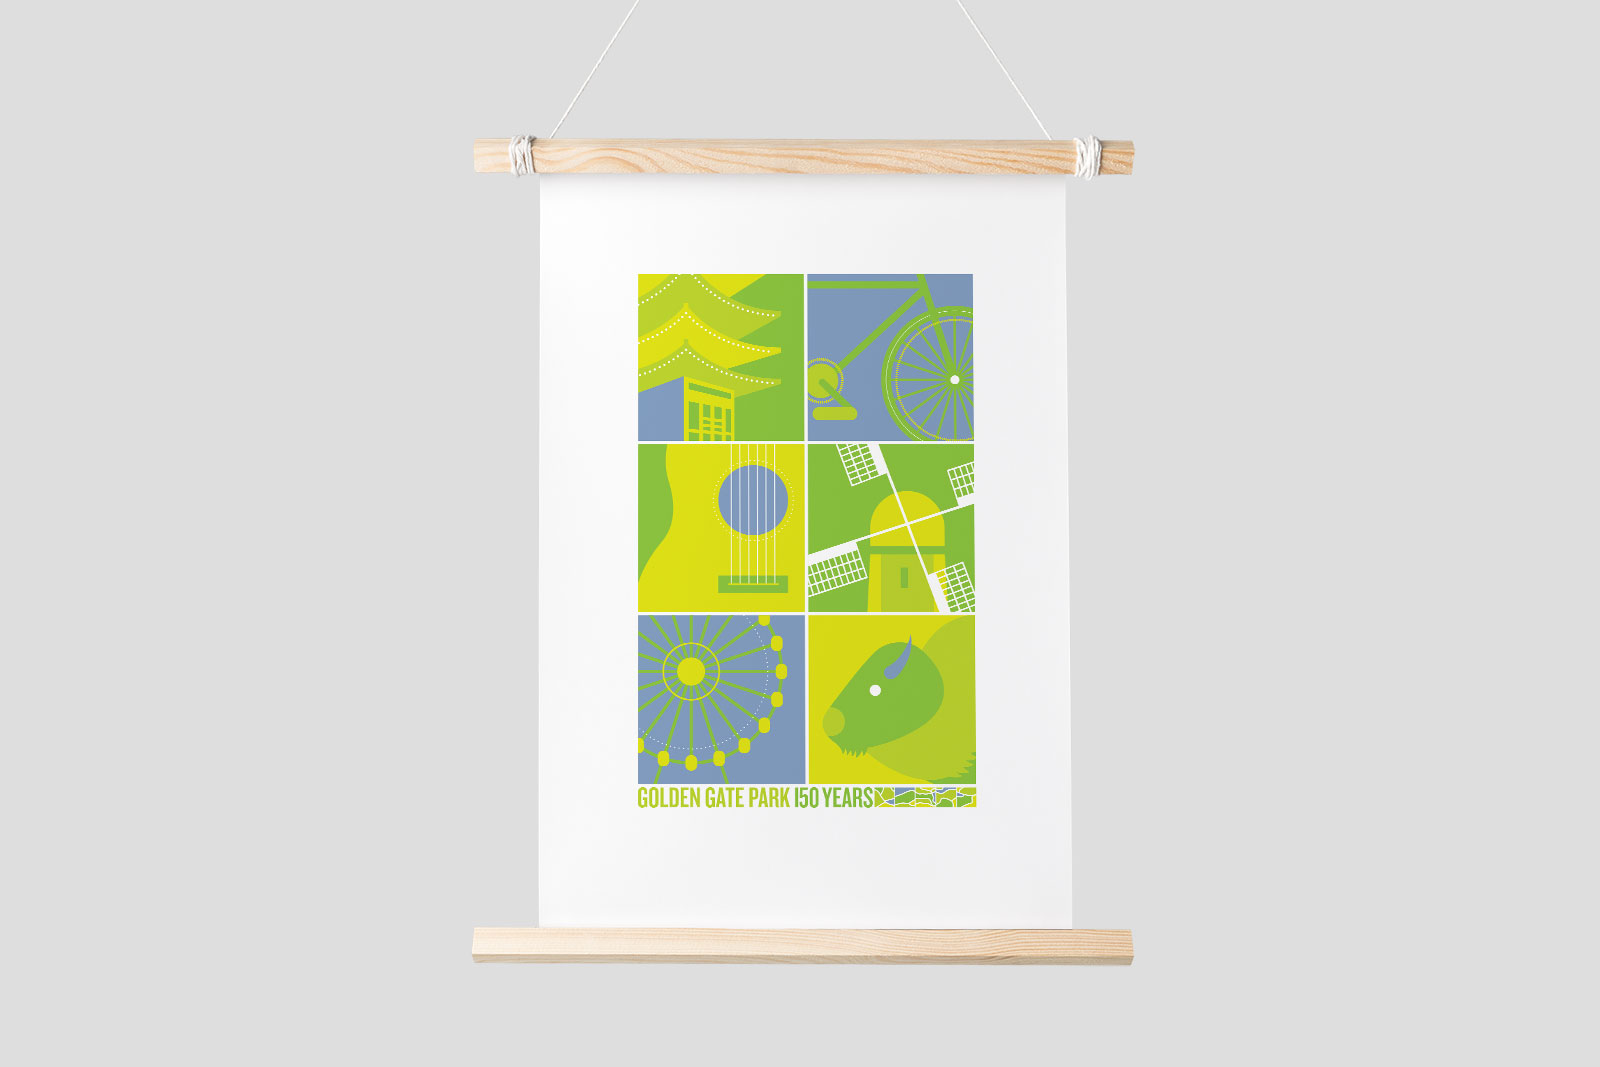 1600_13-Poster-Mockup_GGP